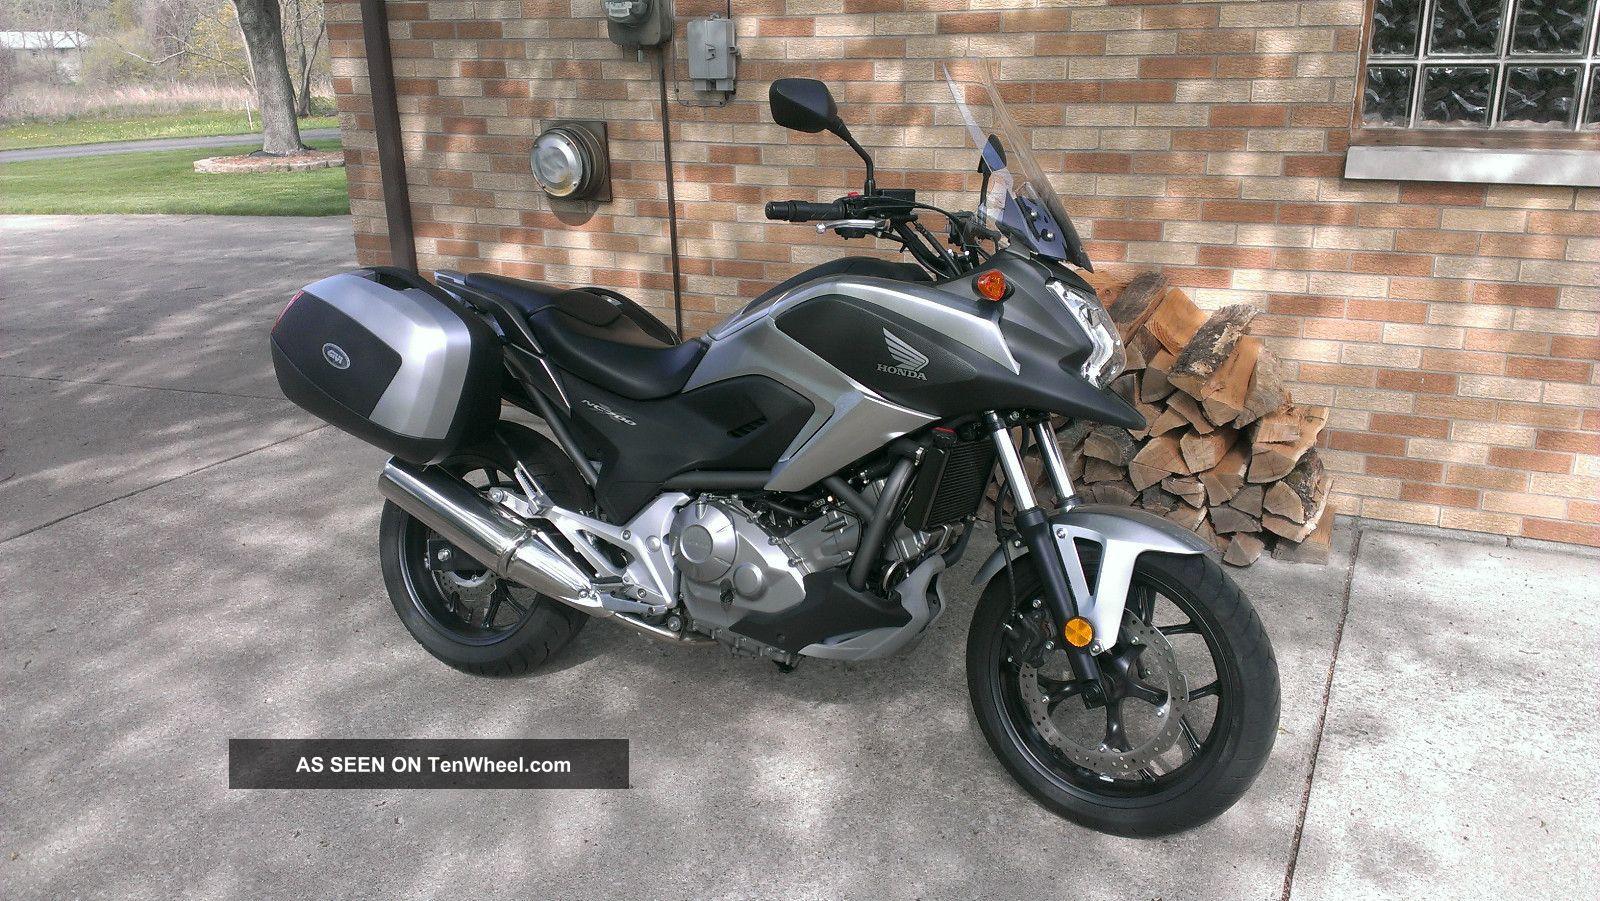 2012 honda nc700x motorcycle. Black Bedroom Furniture Sets. Home Design Ideas